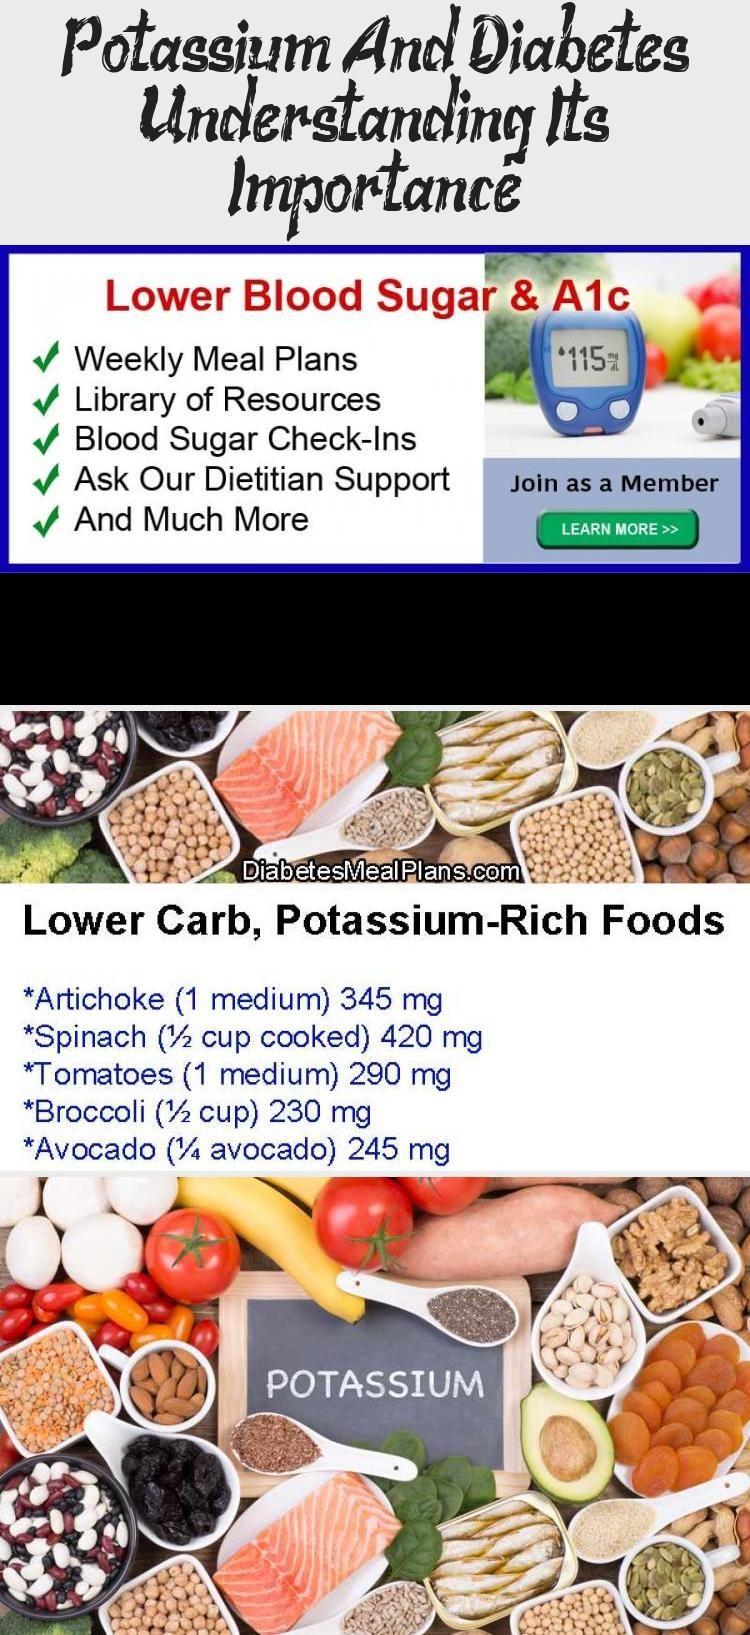 DiabeticRecipesChicken DiabeticRecipesCake